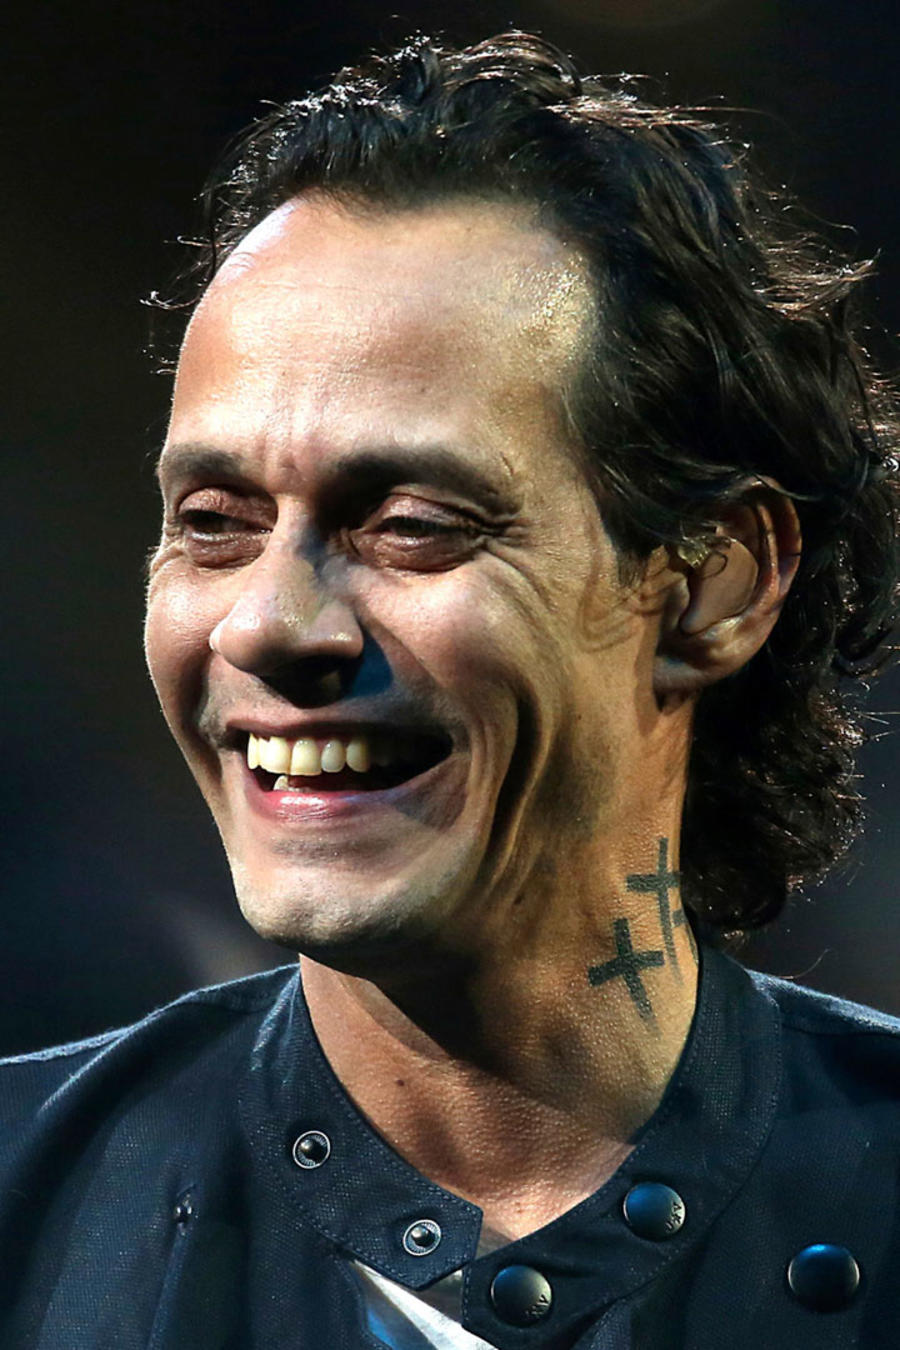 Marc Anthony sonriendo